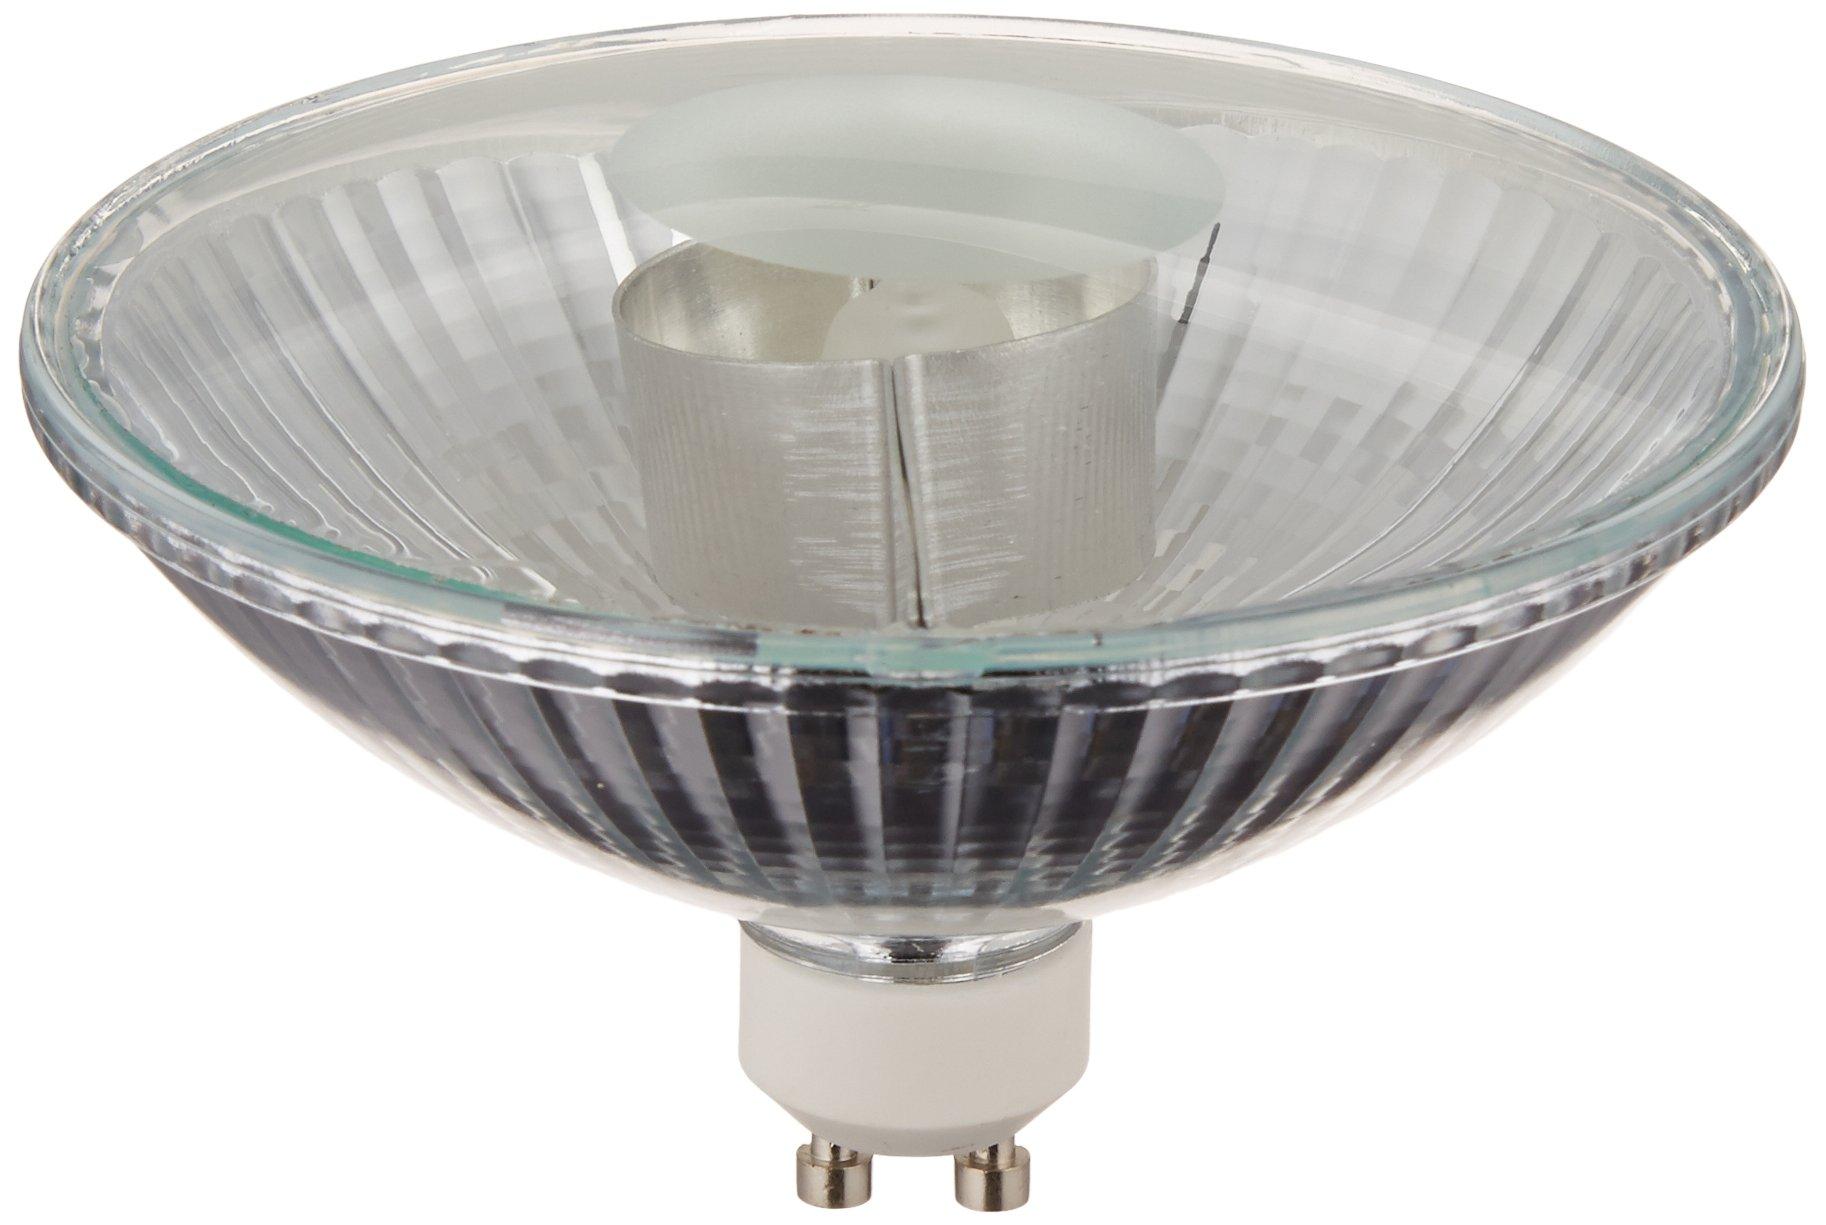 Bulbrite 75R111GU/FL 75-Watt Halogen R111 Reflector, GU10 Base Flood Light